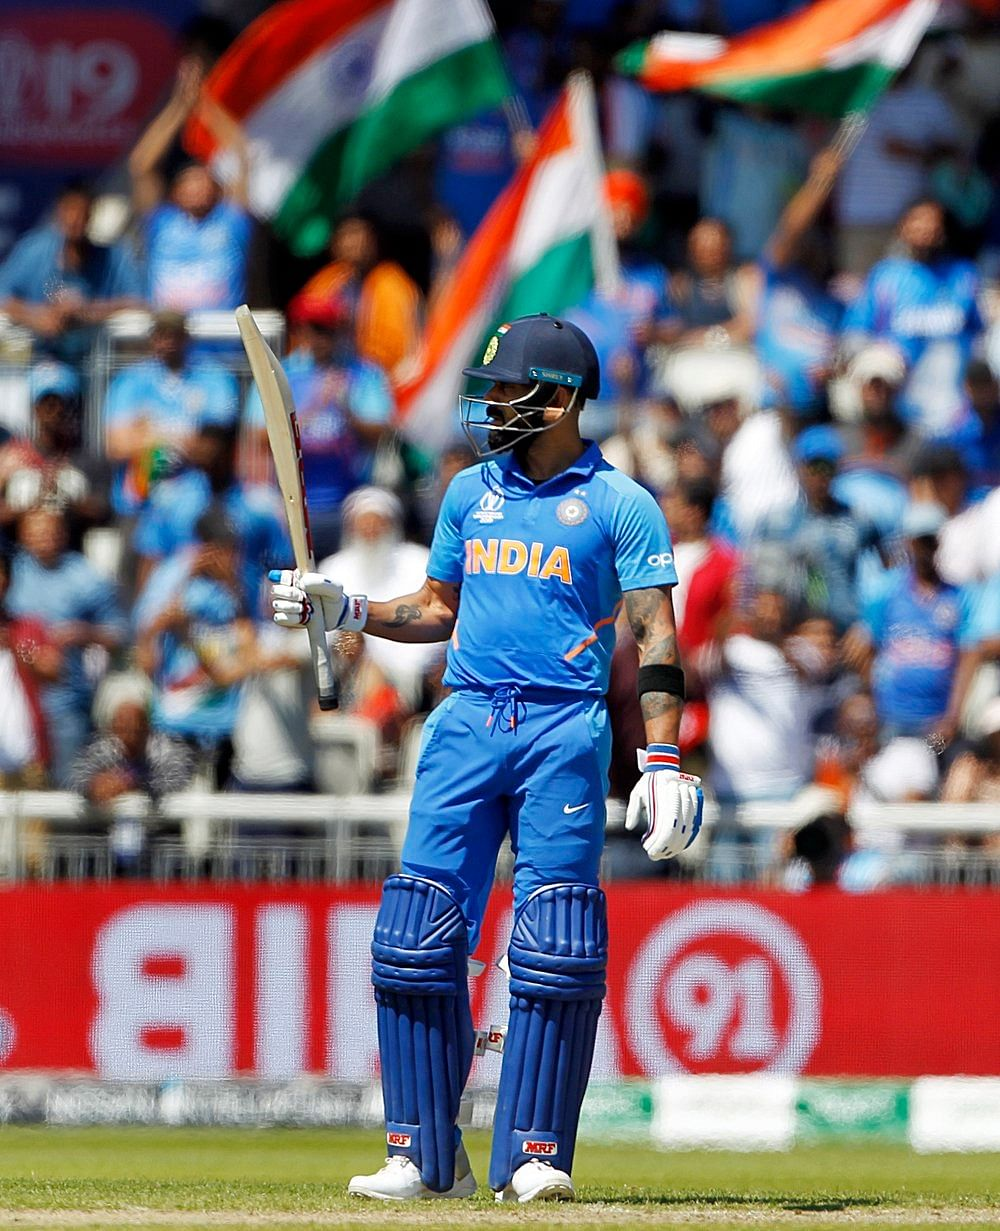 India vs West Indies 2nd ODI: Virat Kohli scores his 42nd century as India beats West Indies